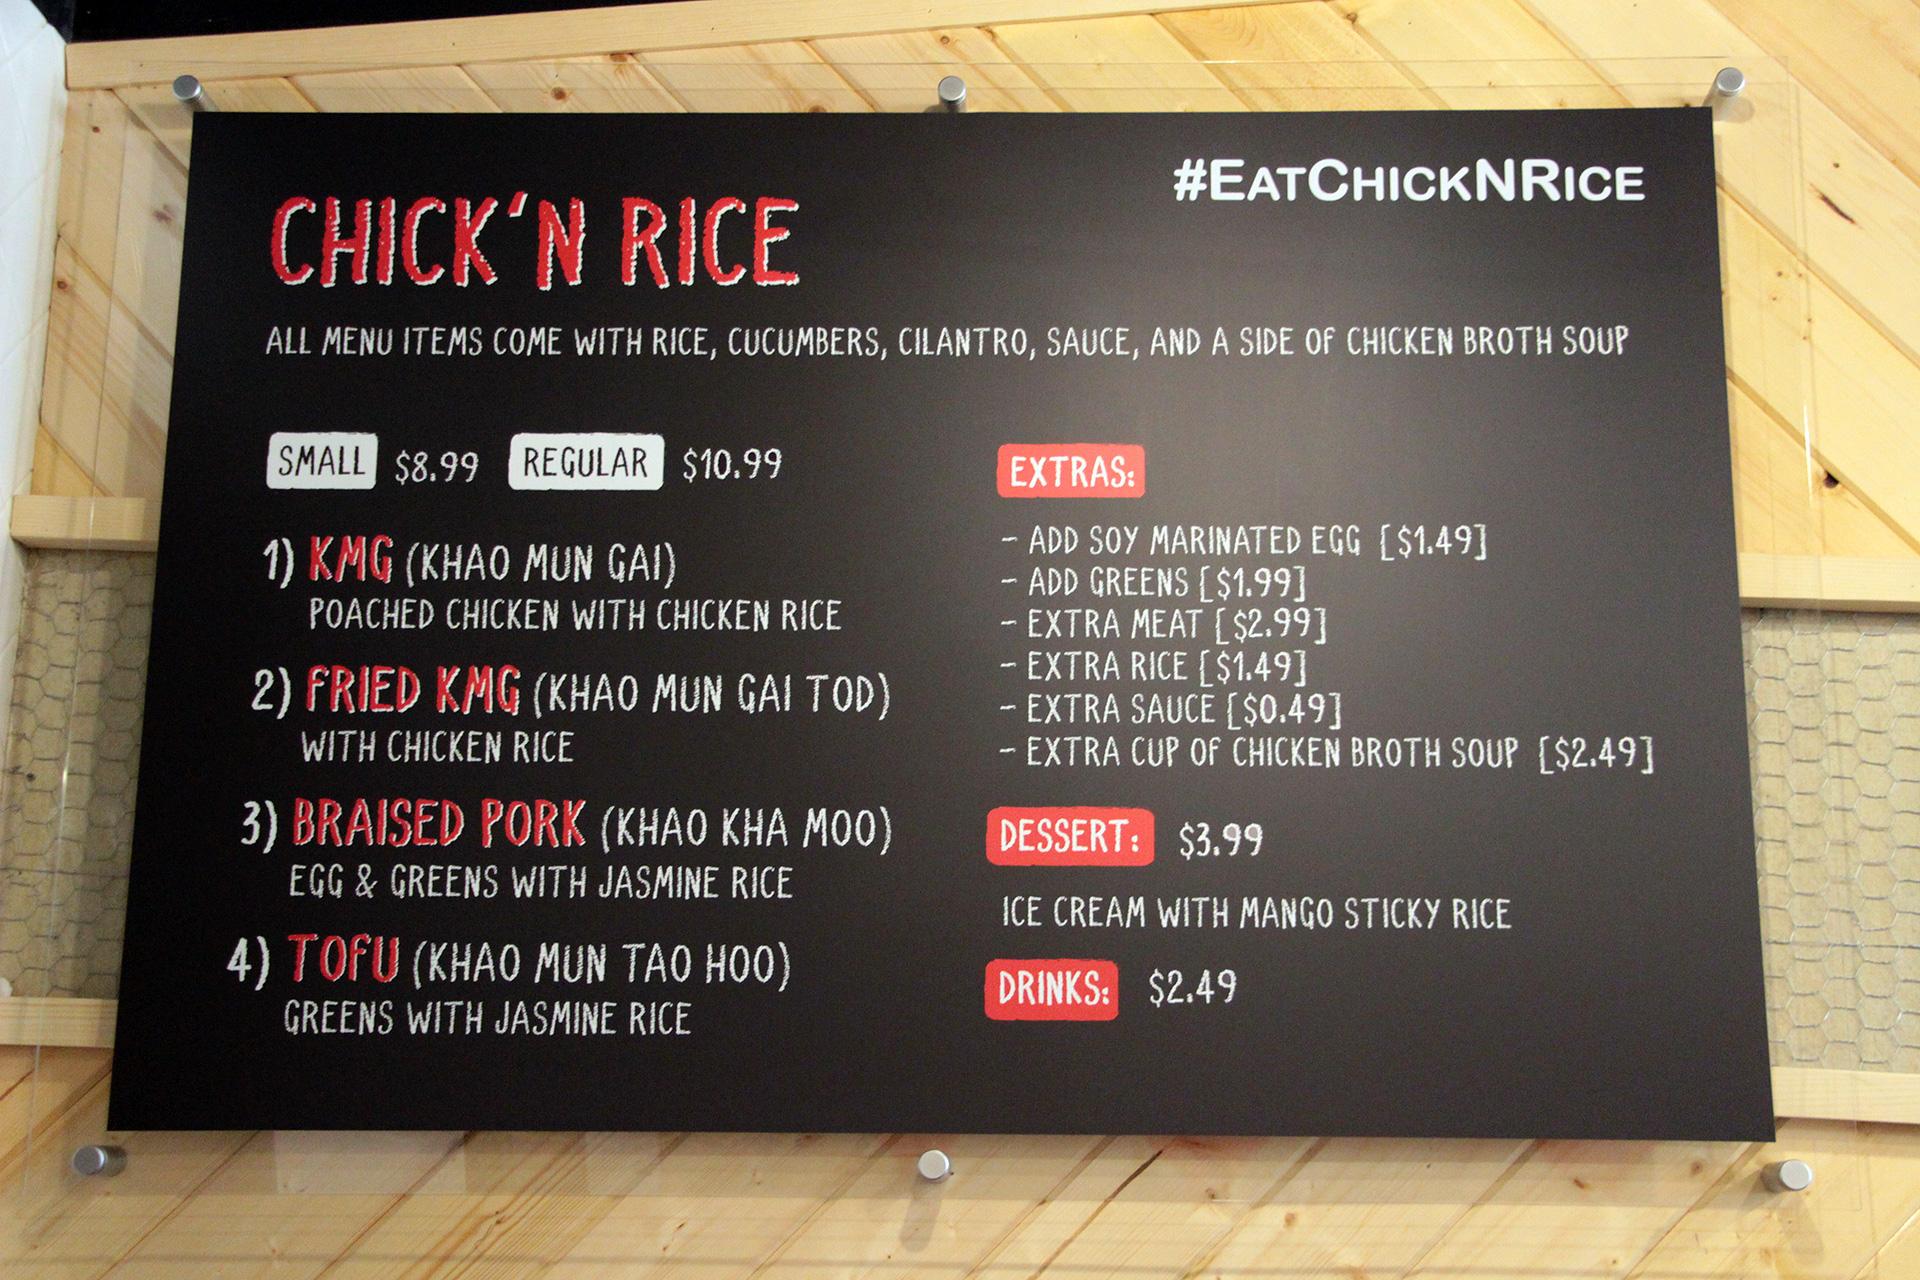 Chick'n Rice menu